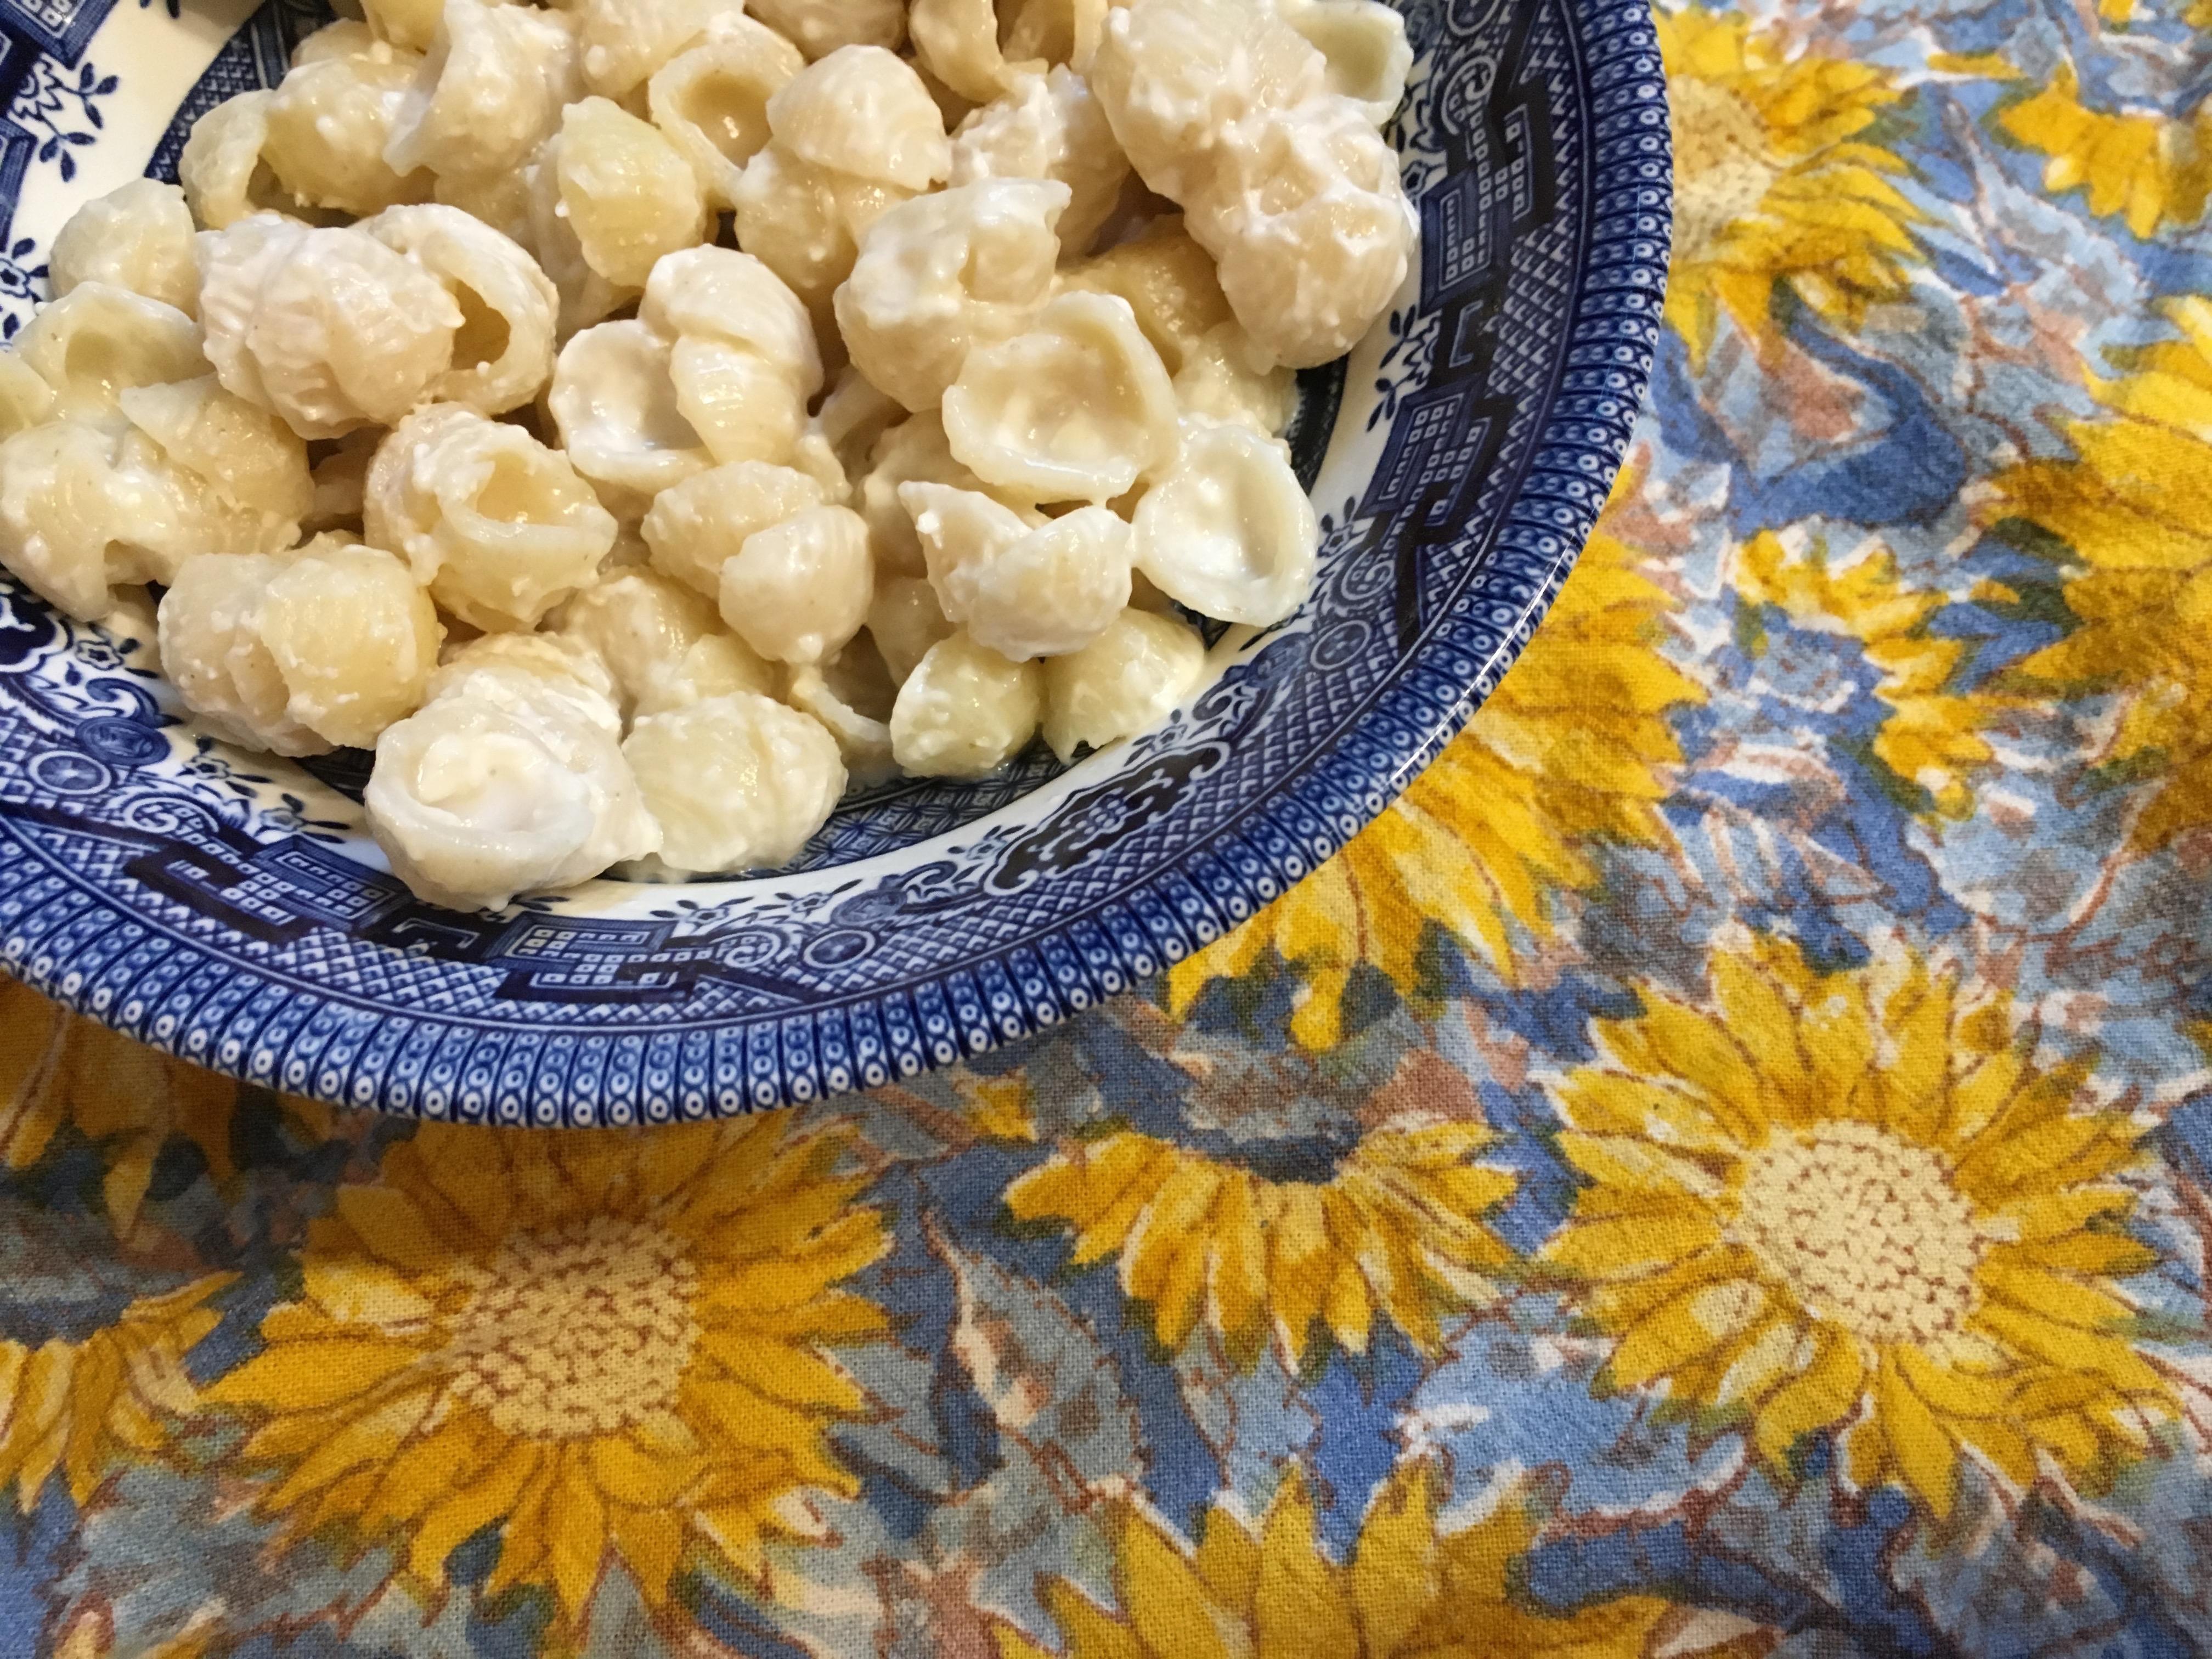 Cheesy shells in a blue bowl